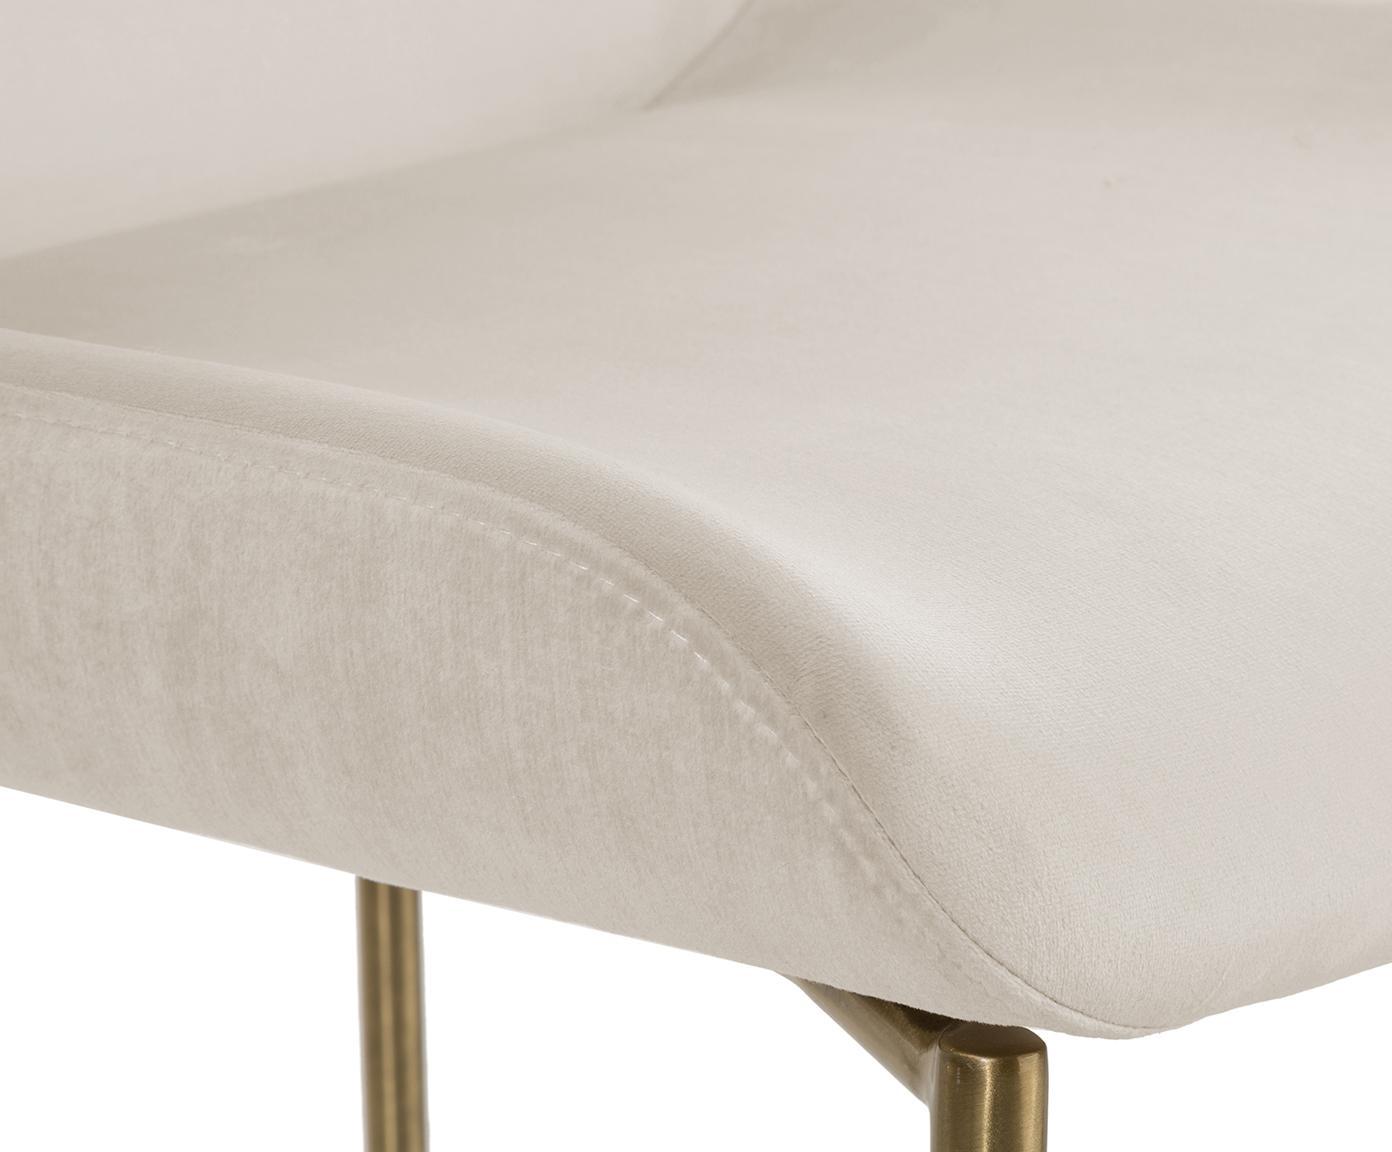 Sedia imbottita in velluto Tess, Rivestimento: velluto (poliestere) 30.0, Gambe: metallo, rivestito, Velluto beige, gambe oro, Larg. 48 x Alt. 64 cm